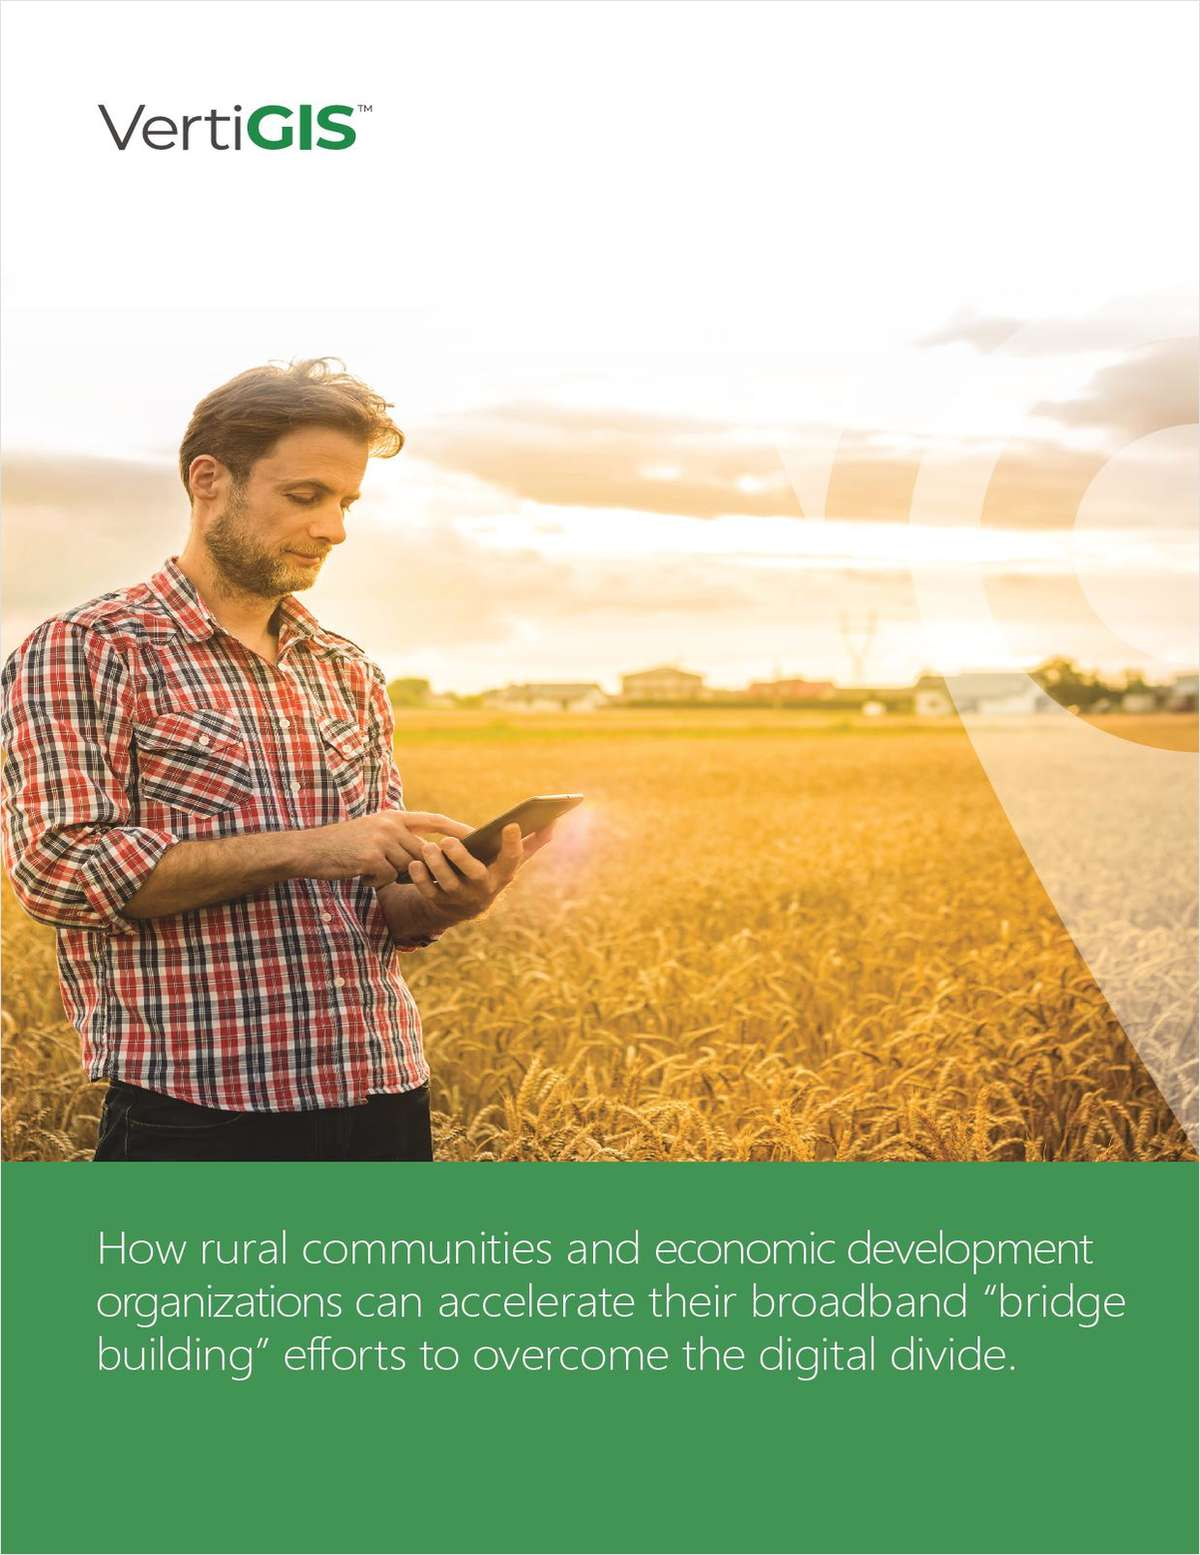 How Rural Communities & Economic Developers Can Accelerate Broadband Bridge Building to Overcome the Digital Divide